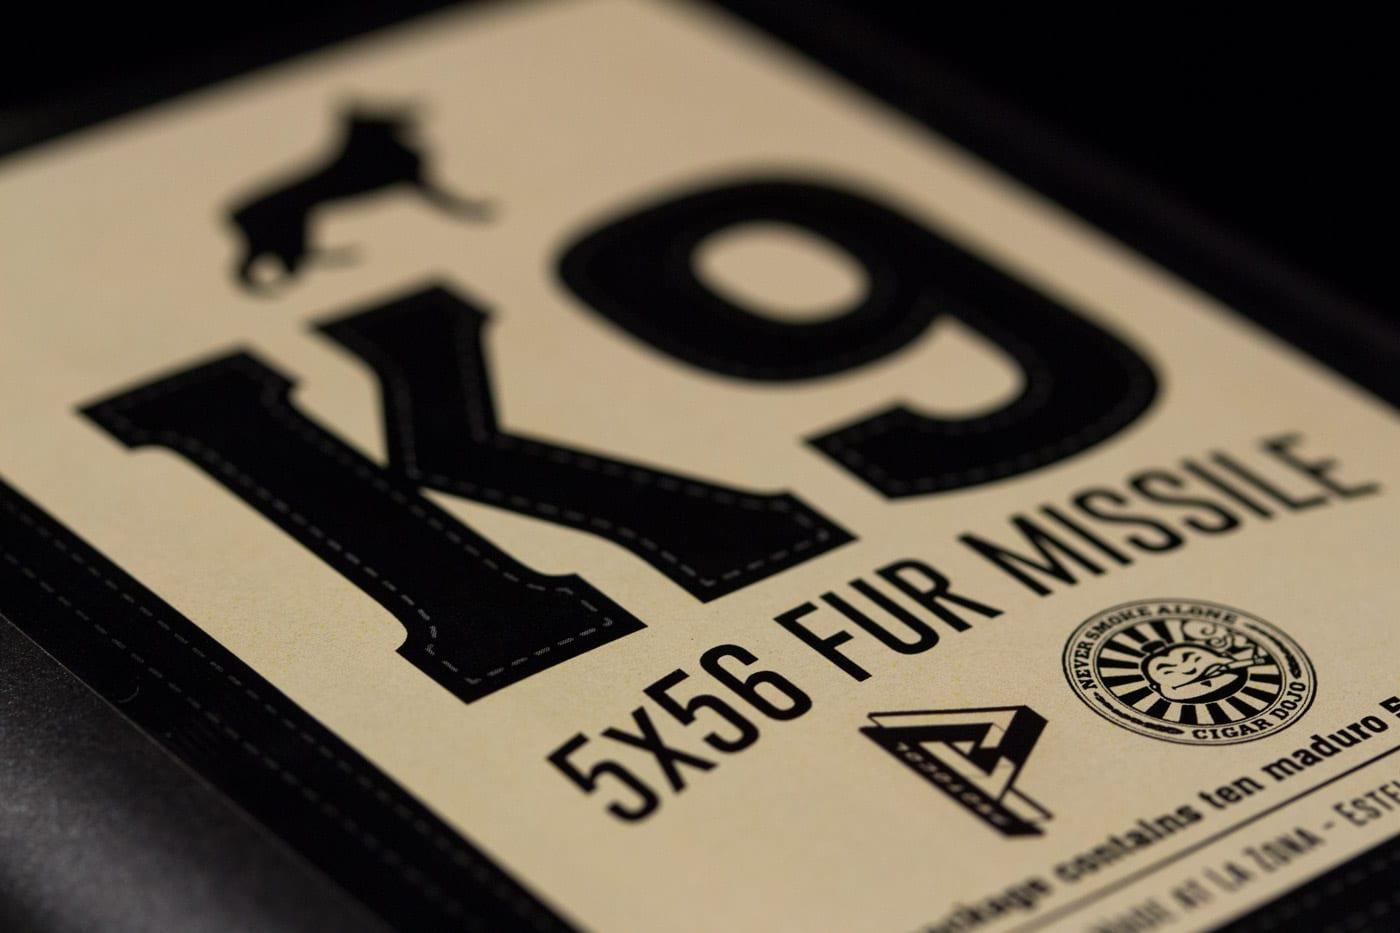 Protocol K9 cigar bundle label